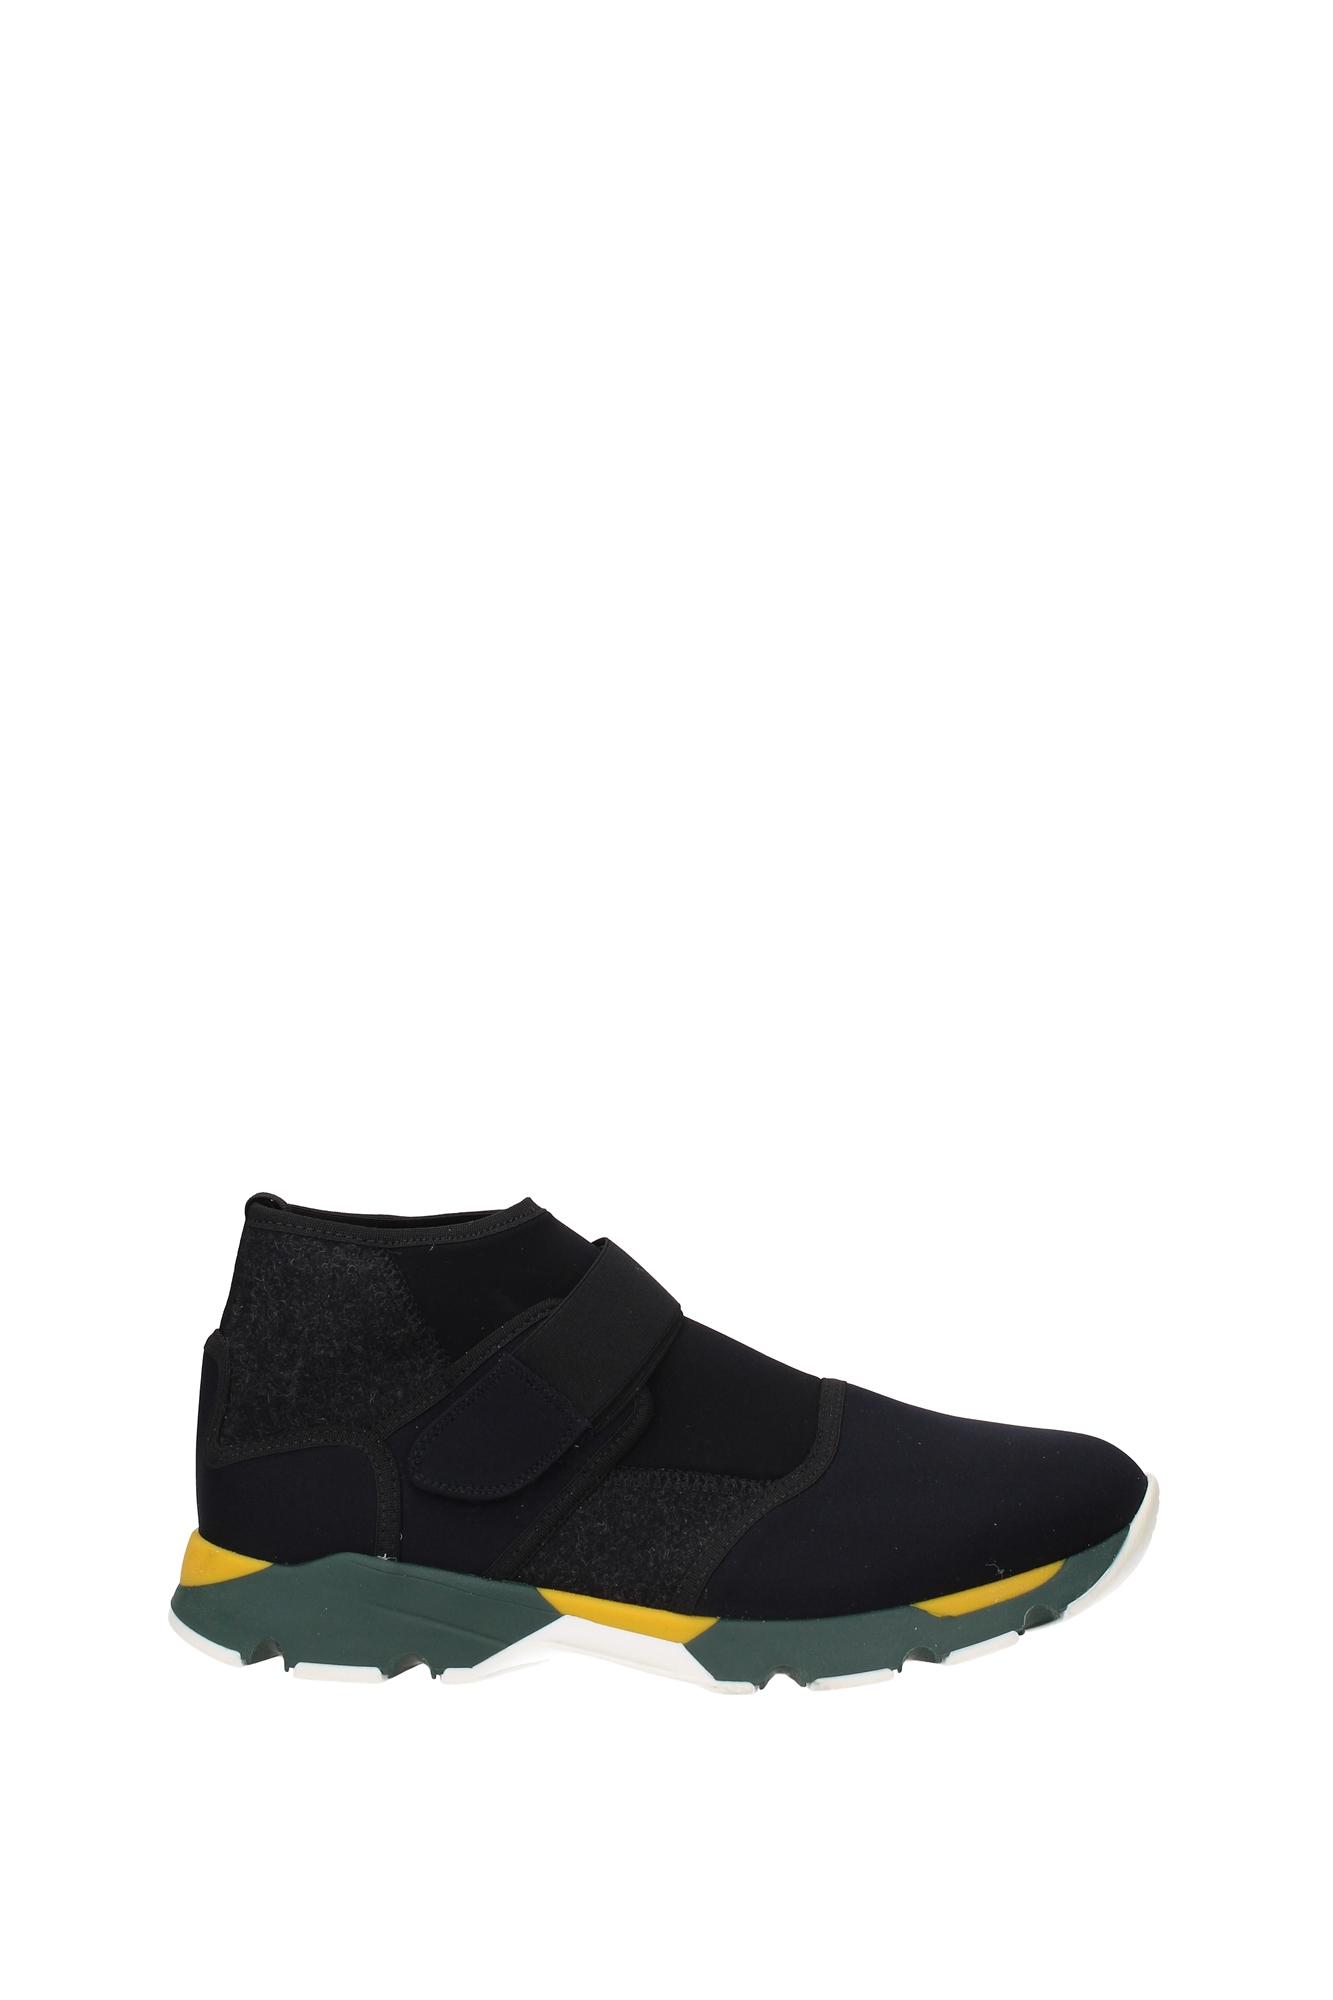 Sneakers Marni Marni Sneakers Herren - Stoff (M24WS0017S47092900) 1b32a4